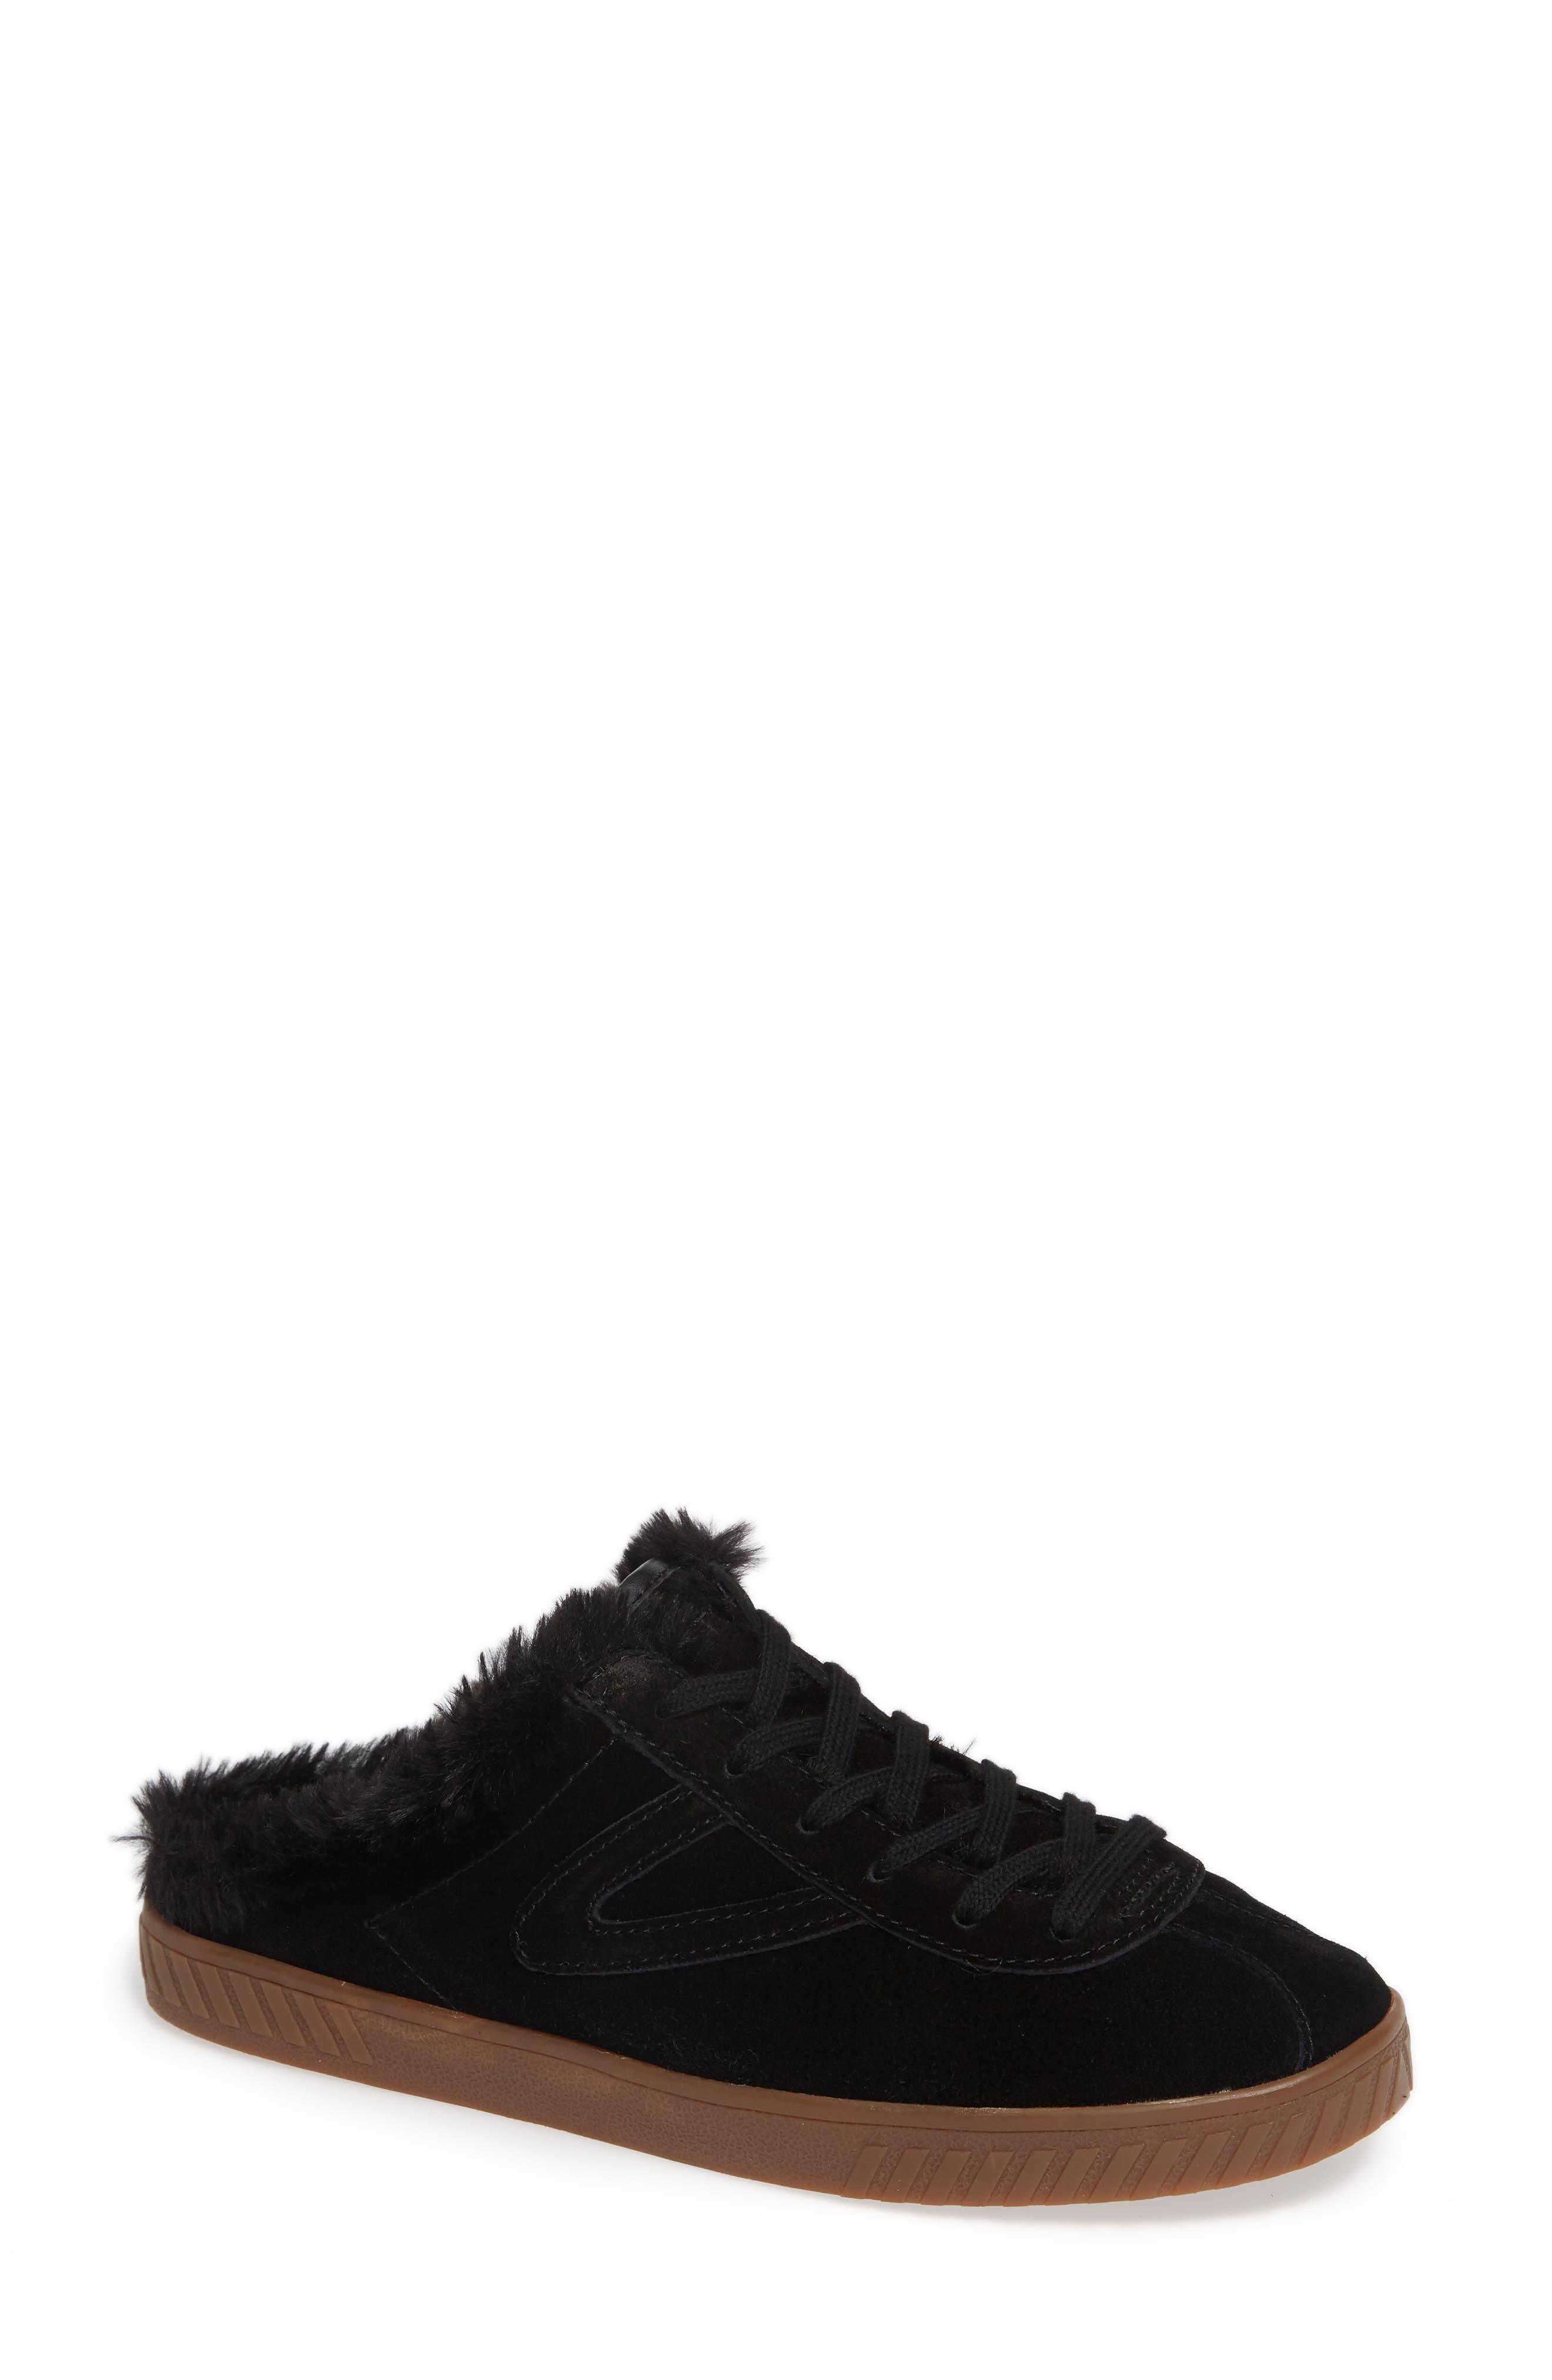 Cam 2 Slip-On Sneaker,                         Main,                         color, BLACK